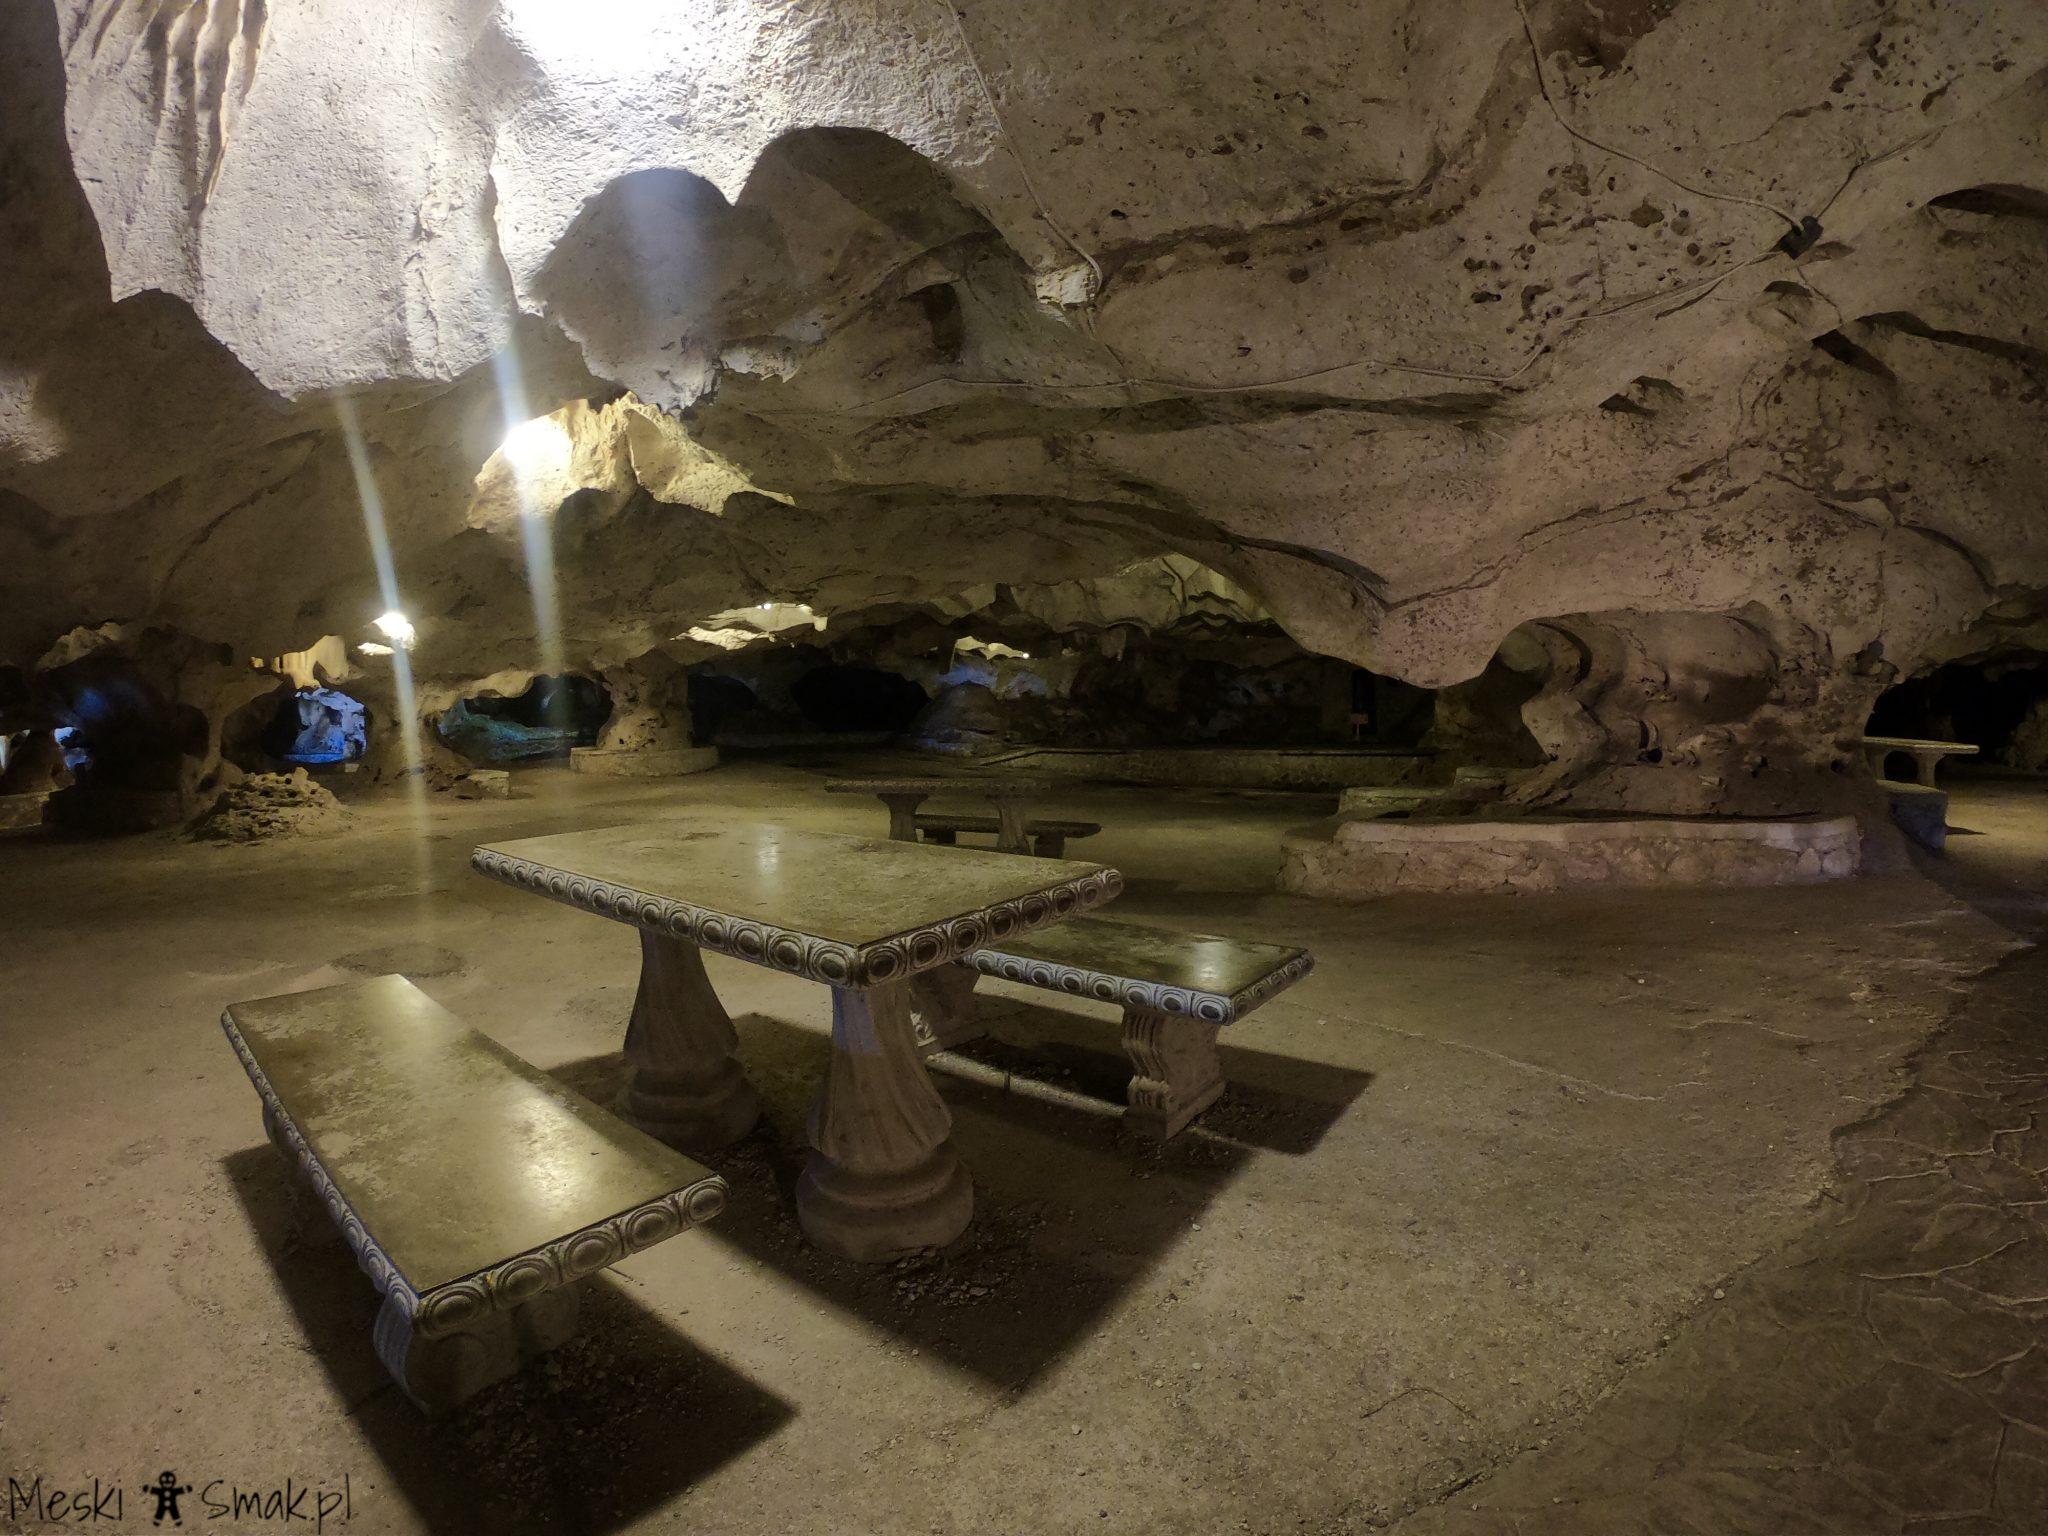 jamajka blog_Green Grotto Caves 3